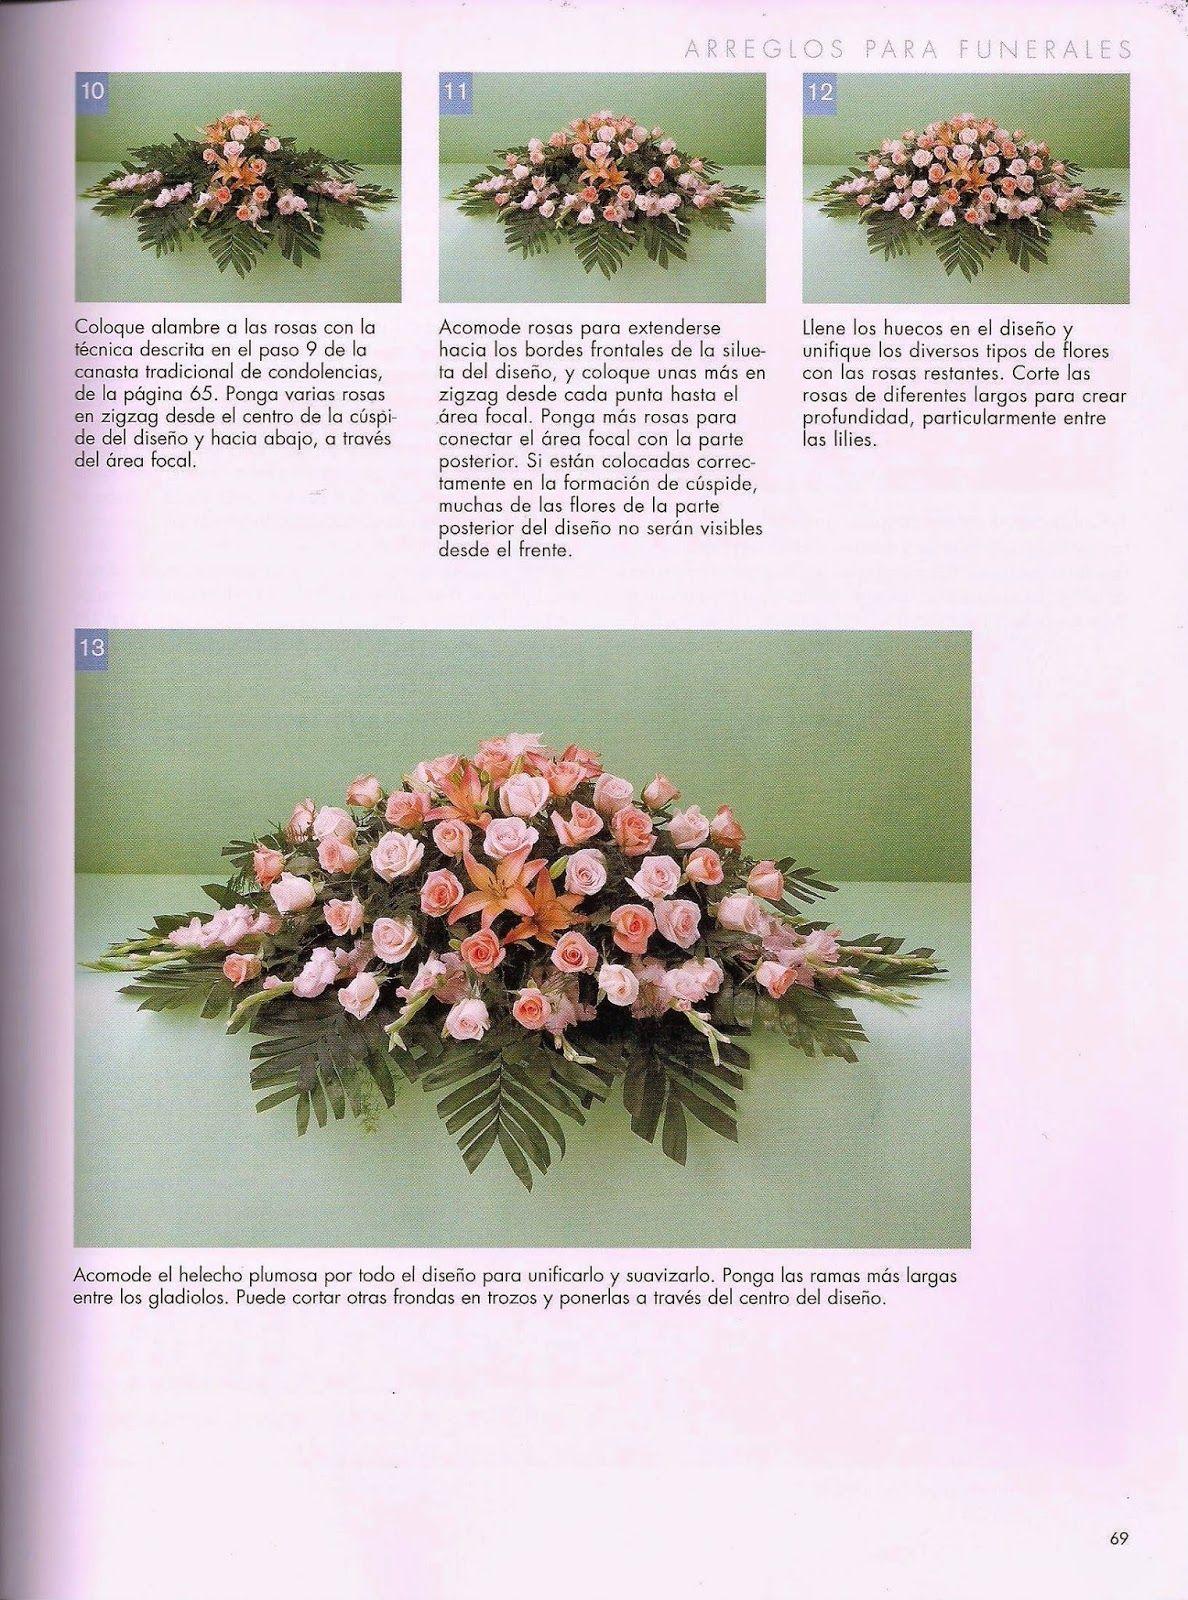 como hacer arreglos florales- revista gratis | FLORES | Pinterest ...